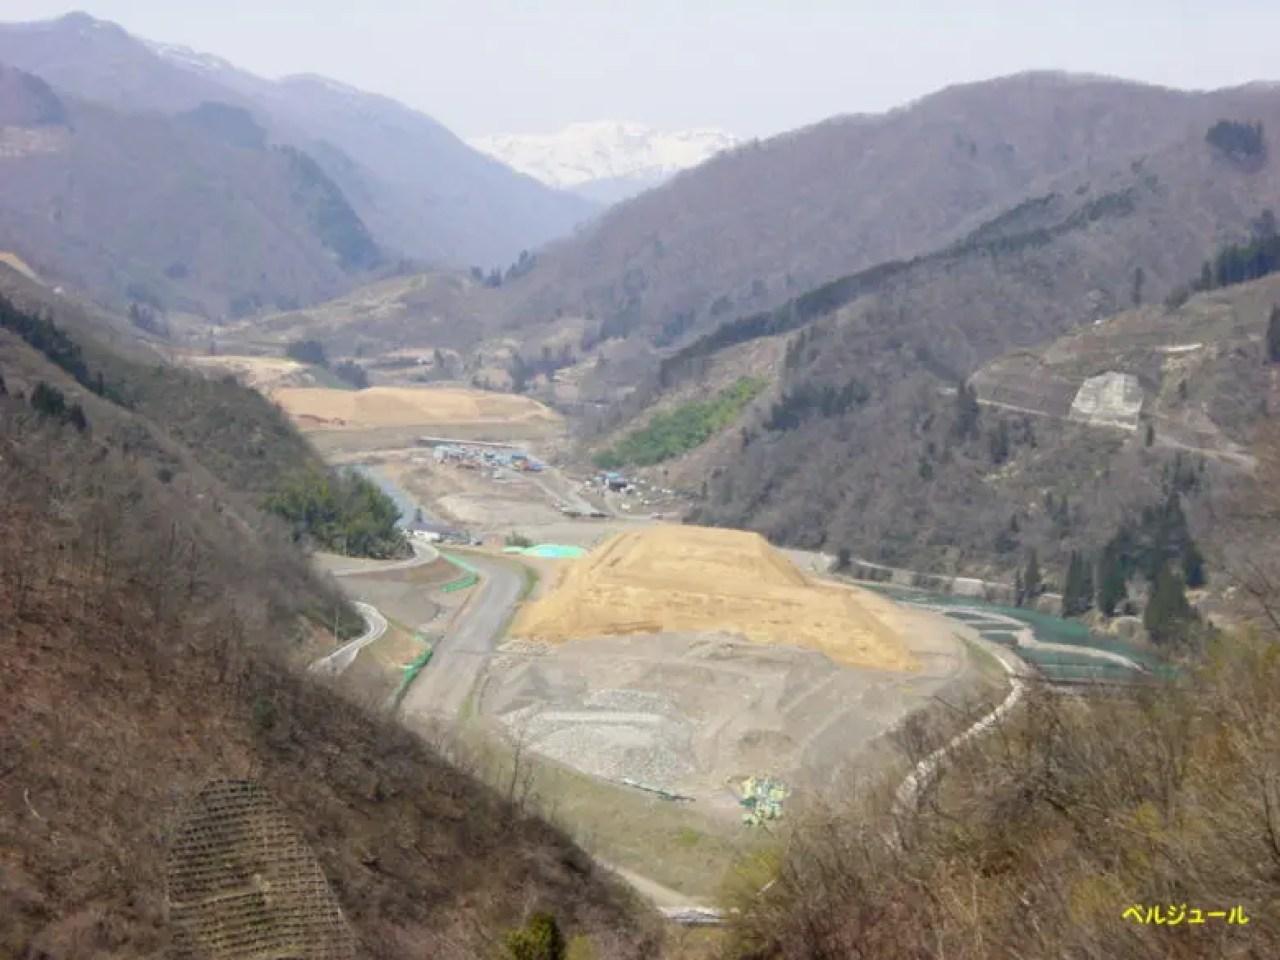 tokuyama00007 - 揖斐川上流・旧徳山村での岩魚釣り